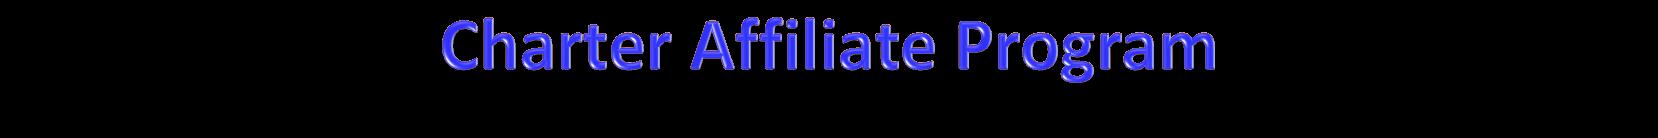 Charter Affiliate